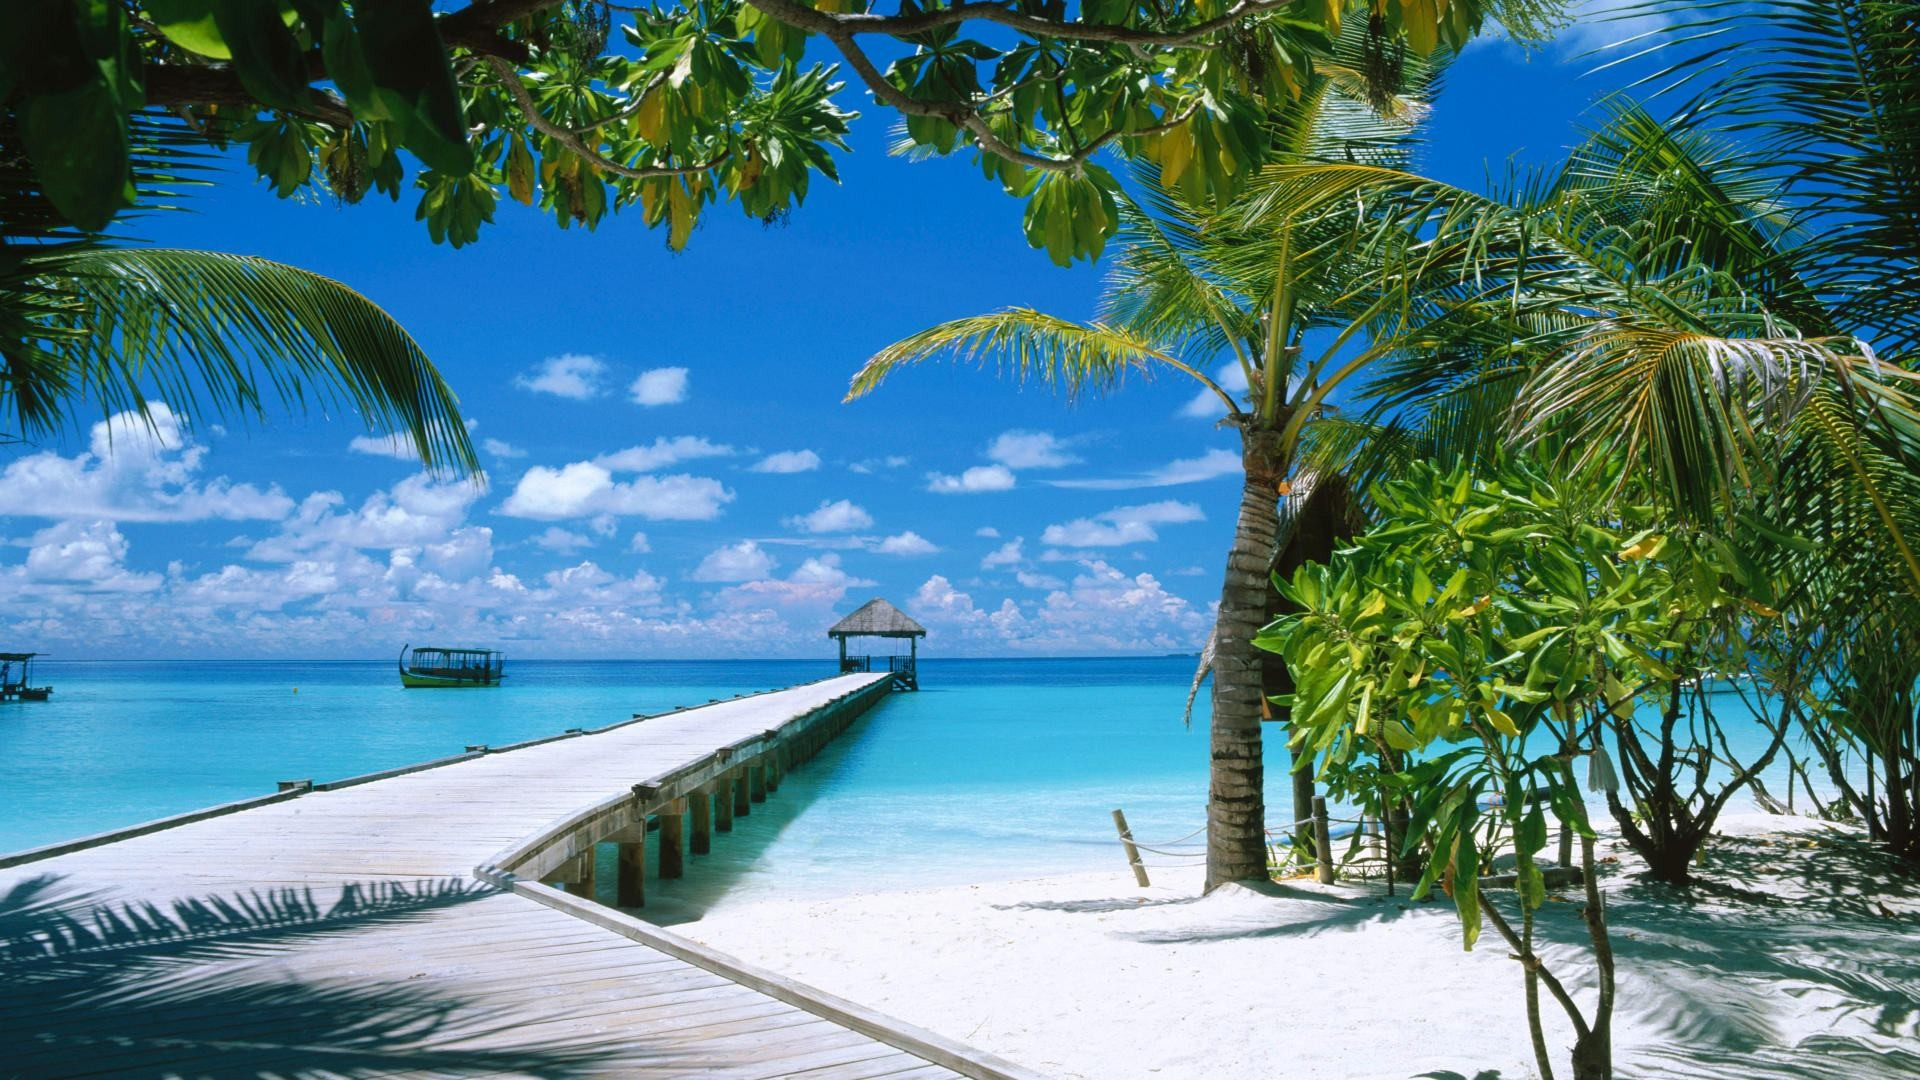 Maldives Atoll Desktop Backgrounds Computer Wallpapers 1920x1080